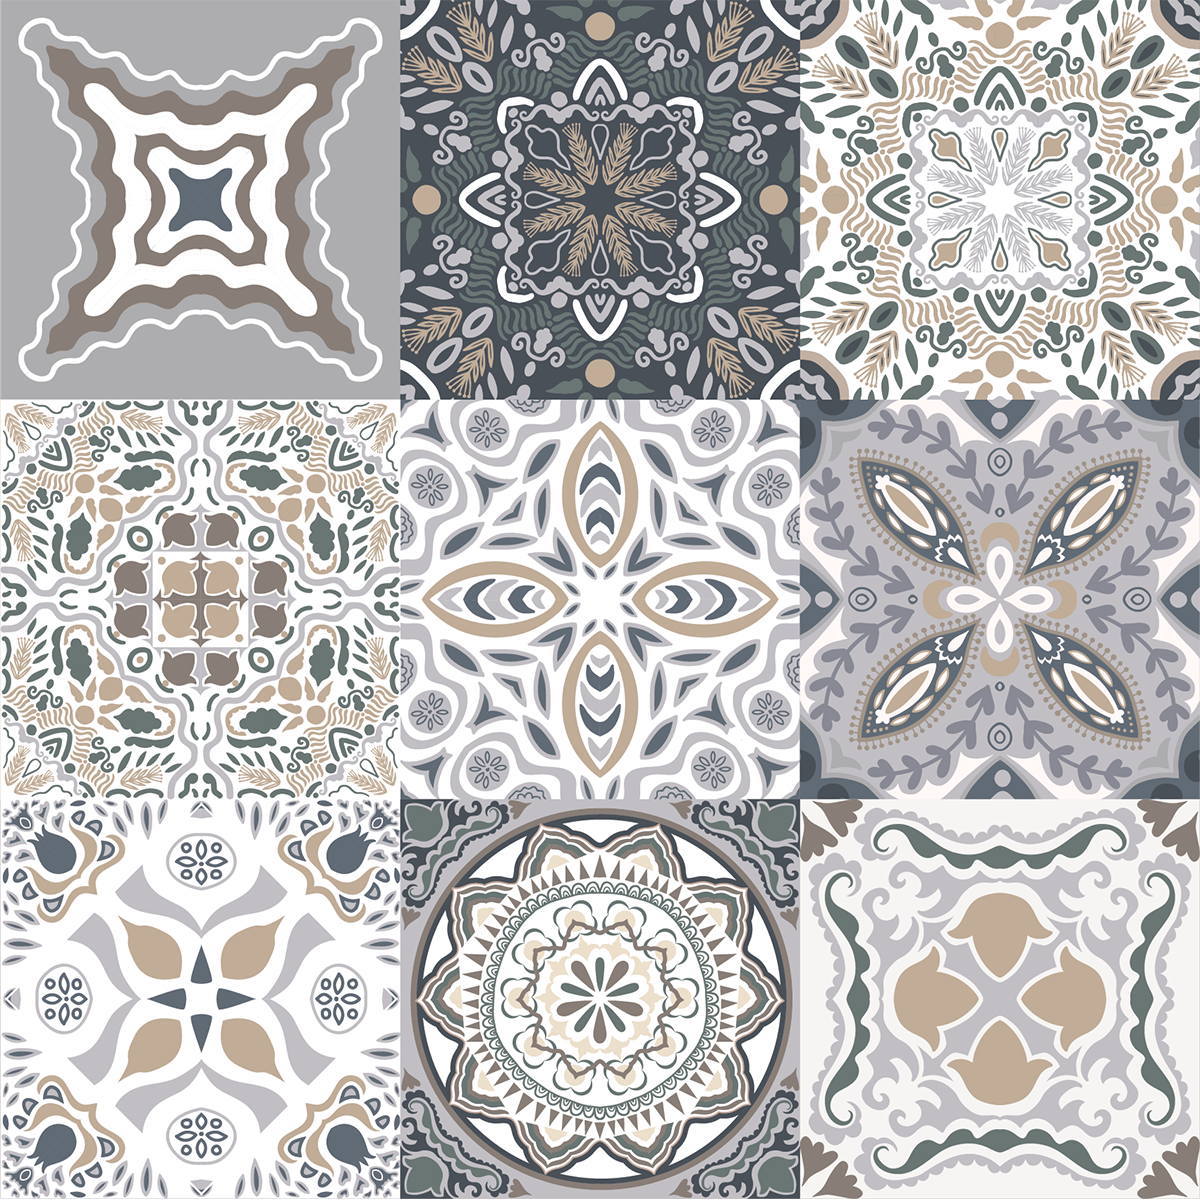 9 stickers carreaux de ciment azulejos orfeo cuisine. Black Bedroom Furniture Sets. Home Design Ideas